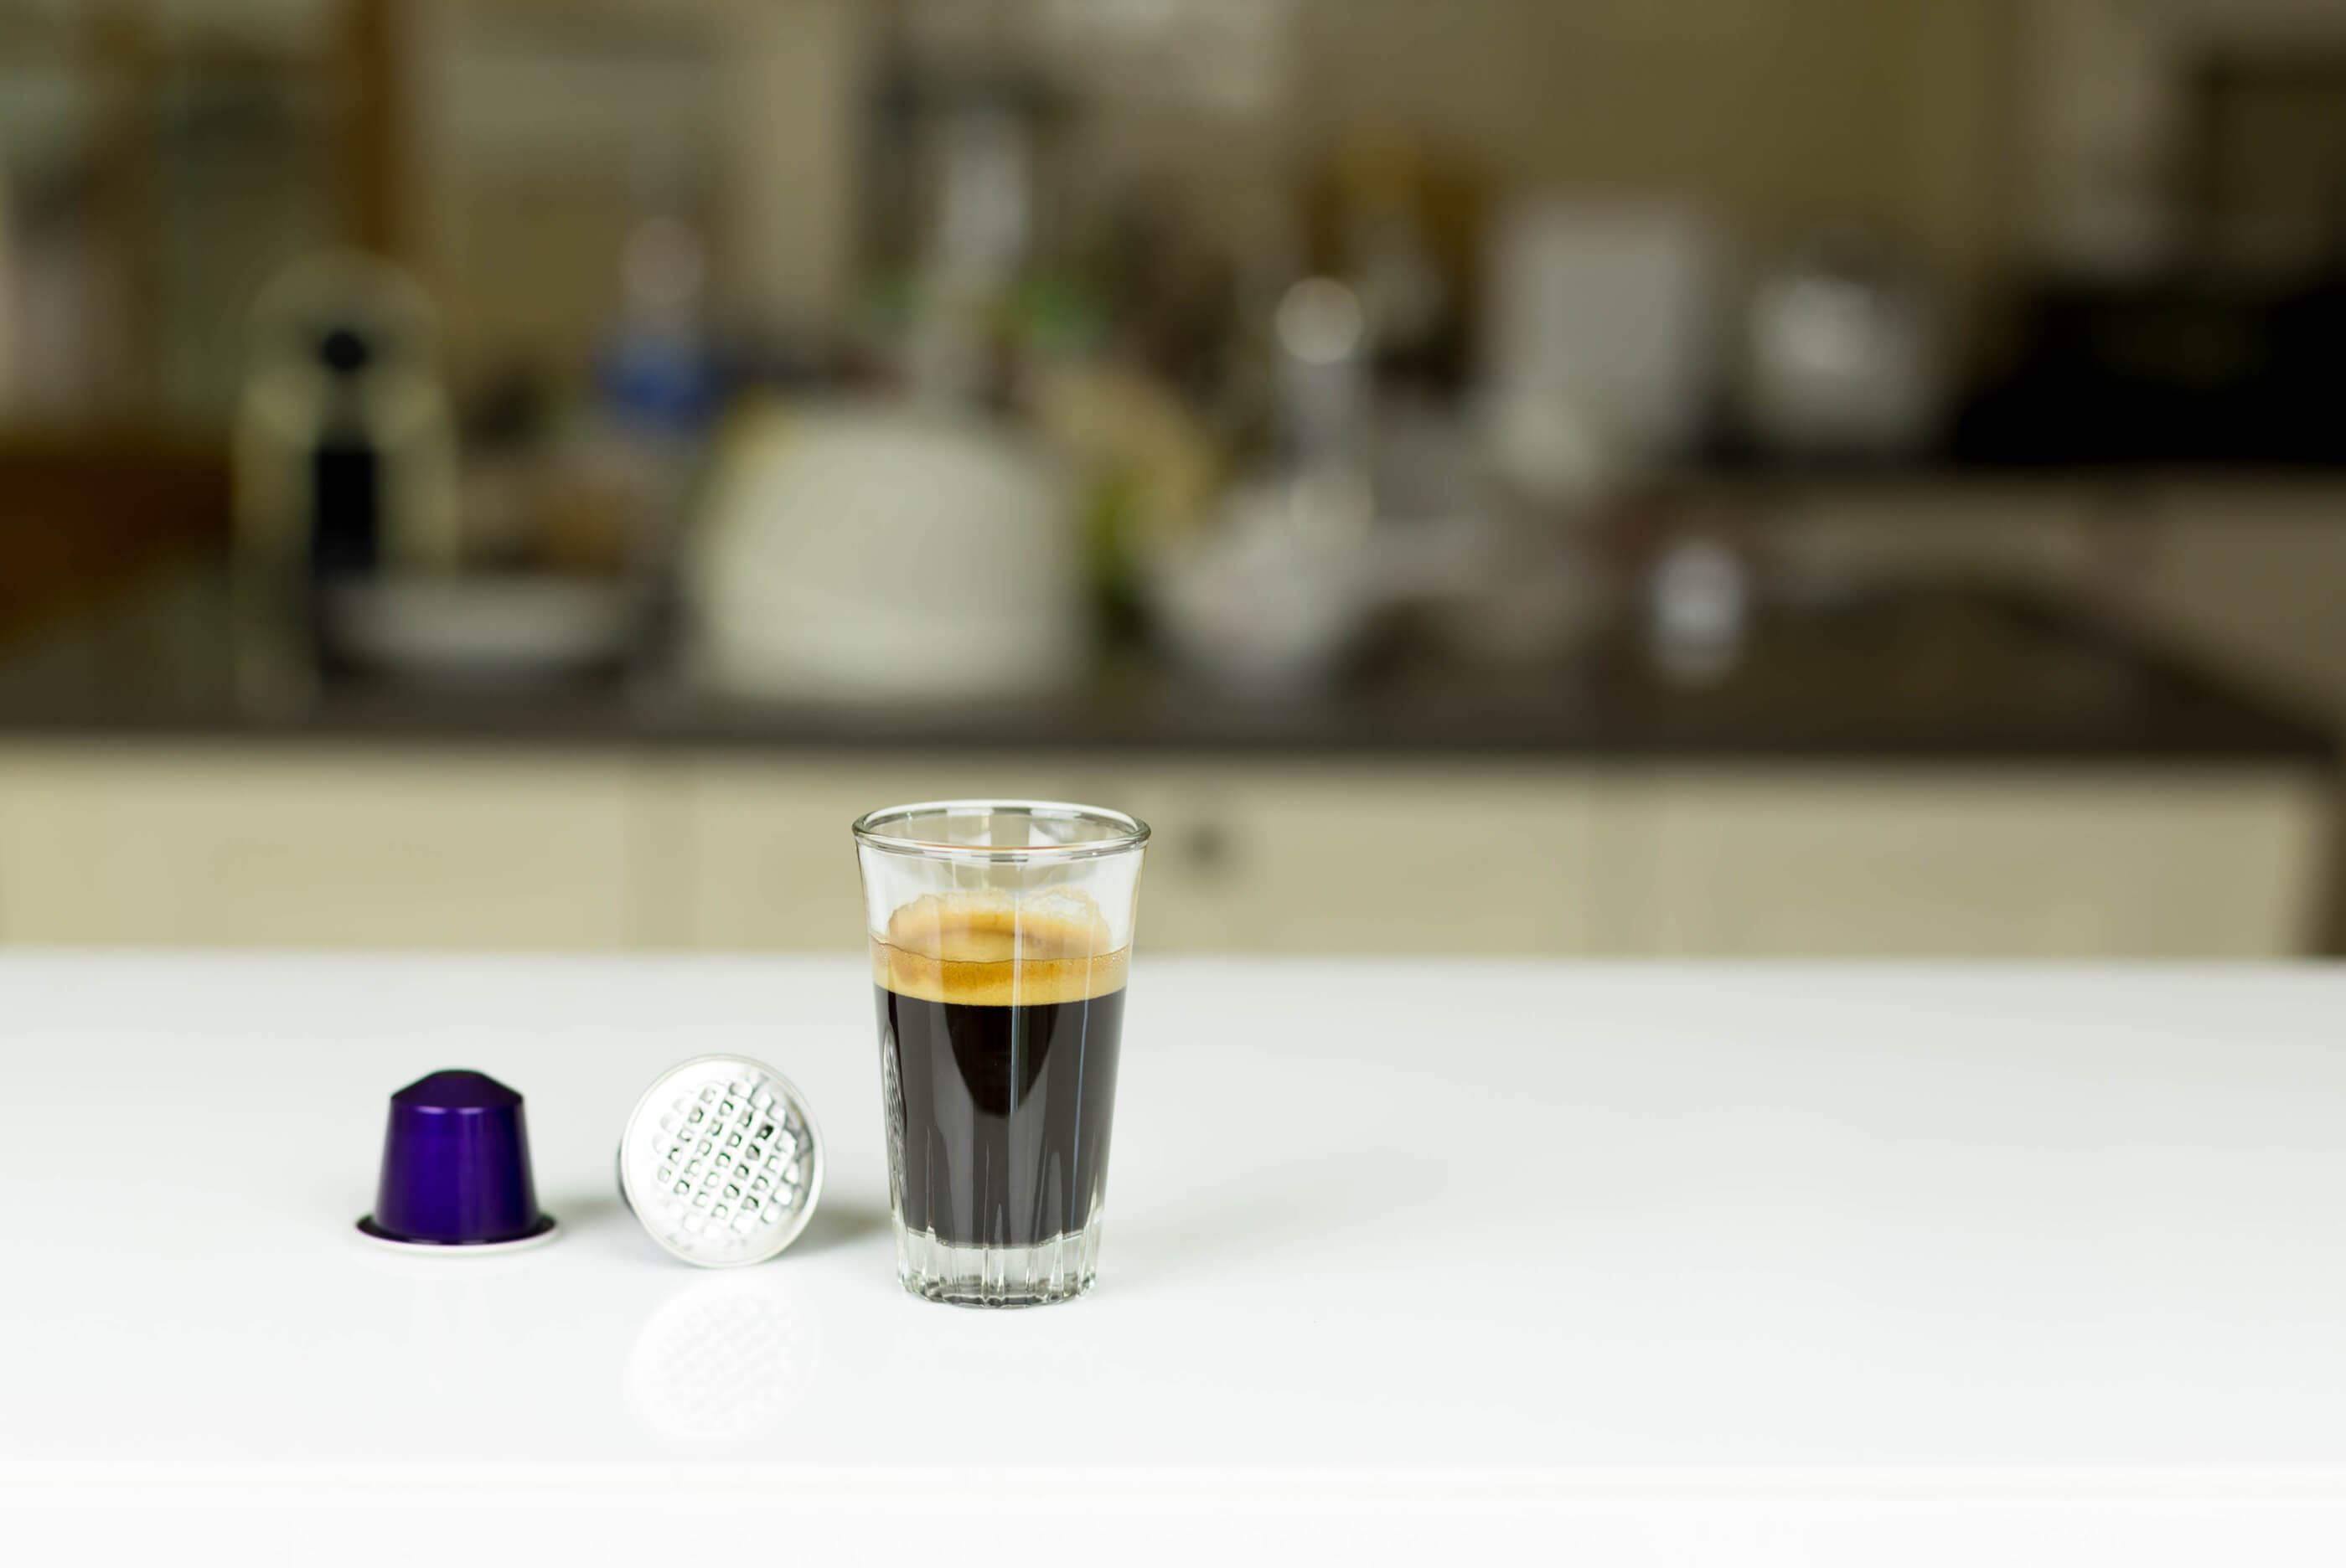 Coffee pods and espresso coffee